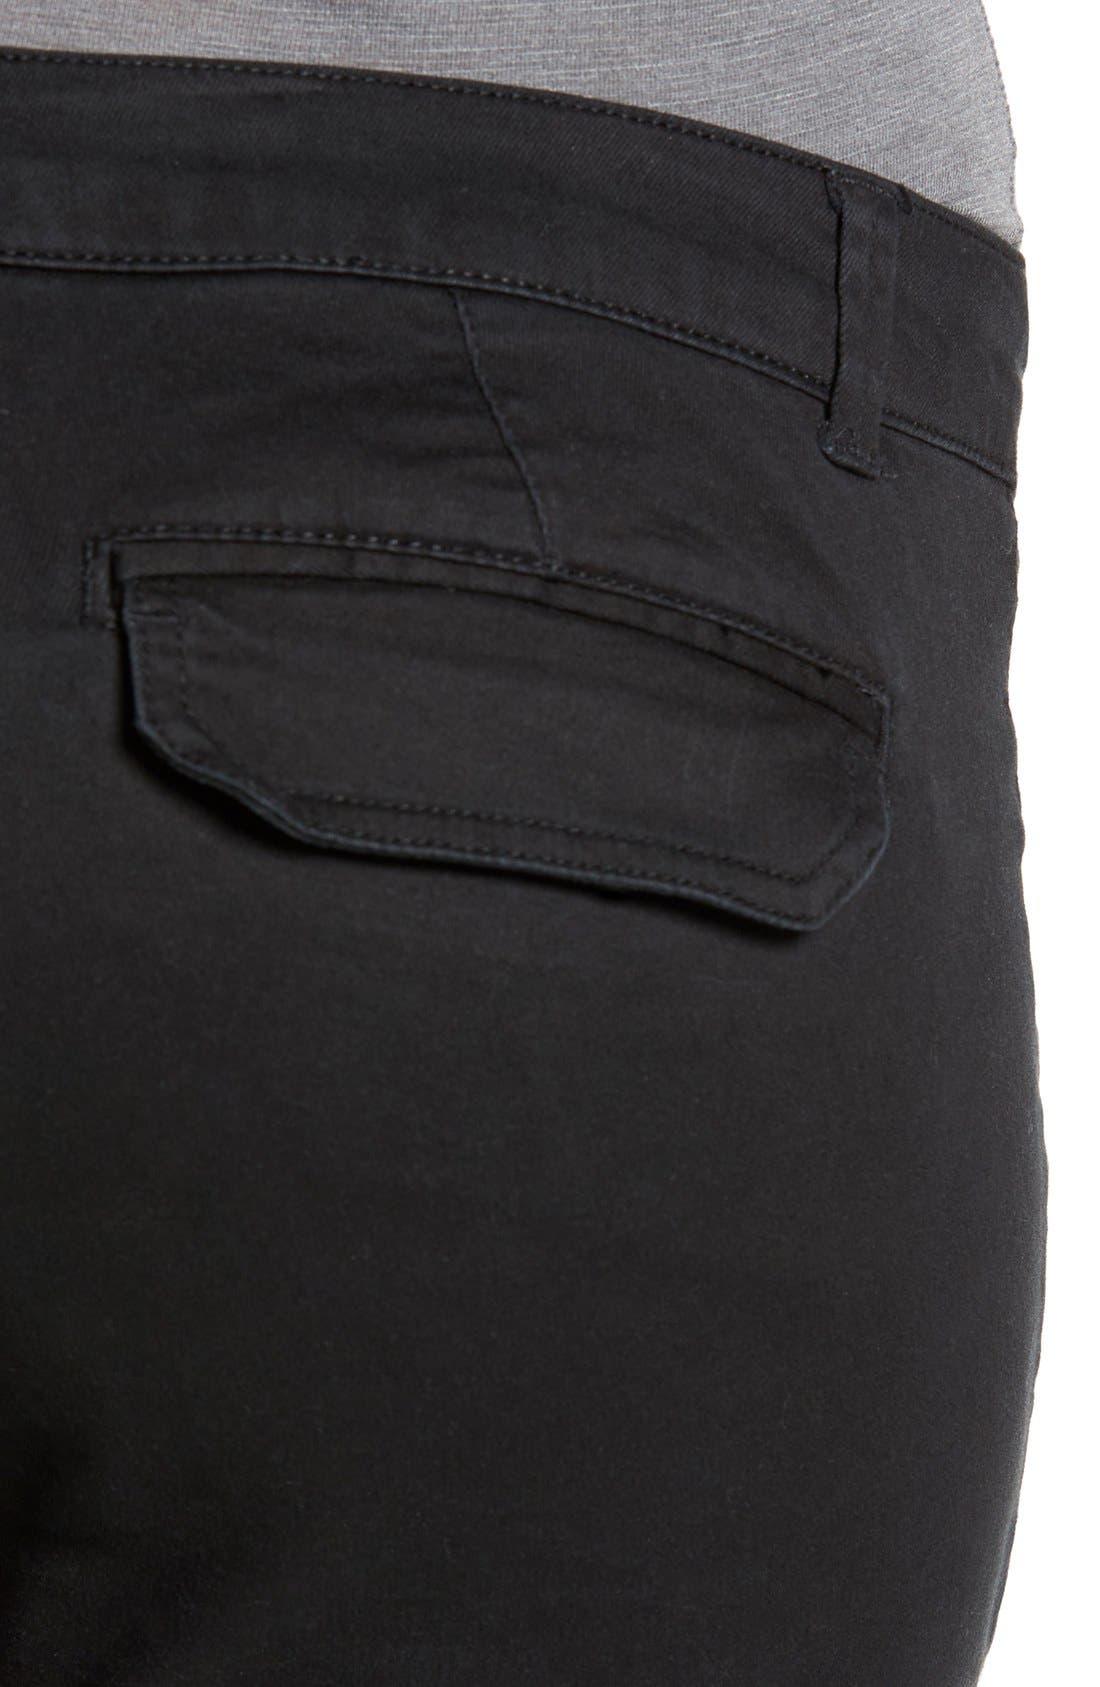 Skinny Cargo Pants,                             Alternate thumbnail 2, color,                             001